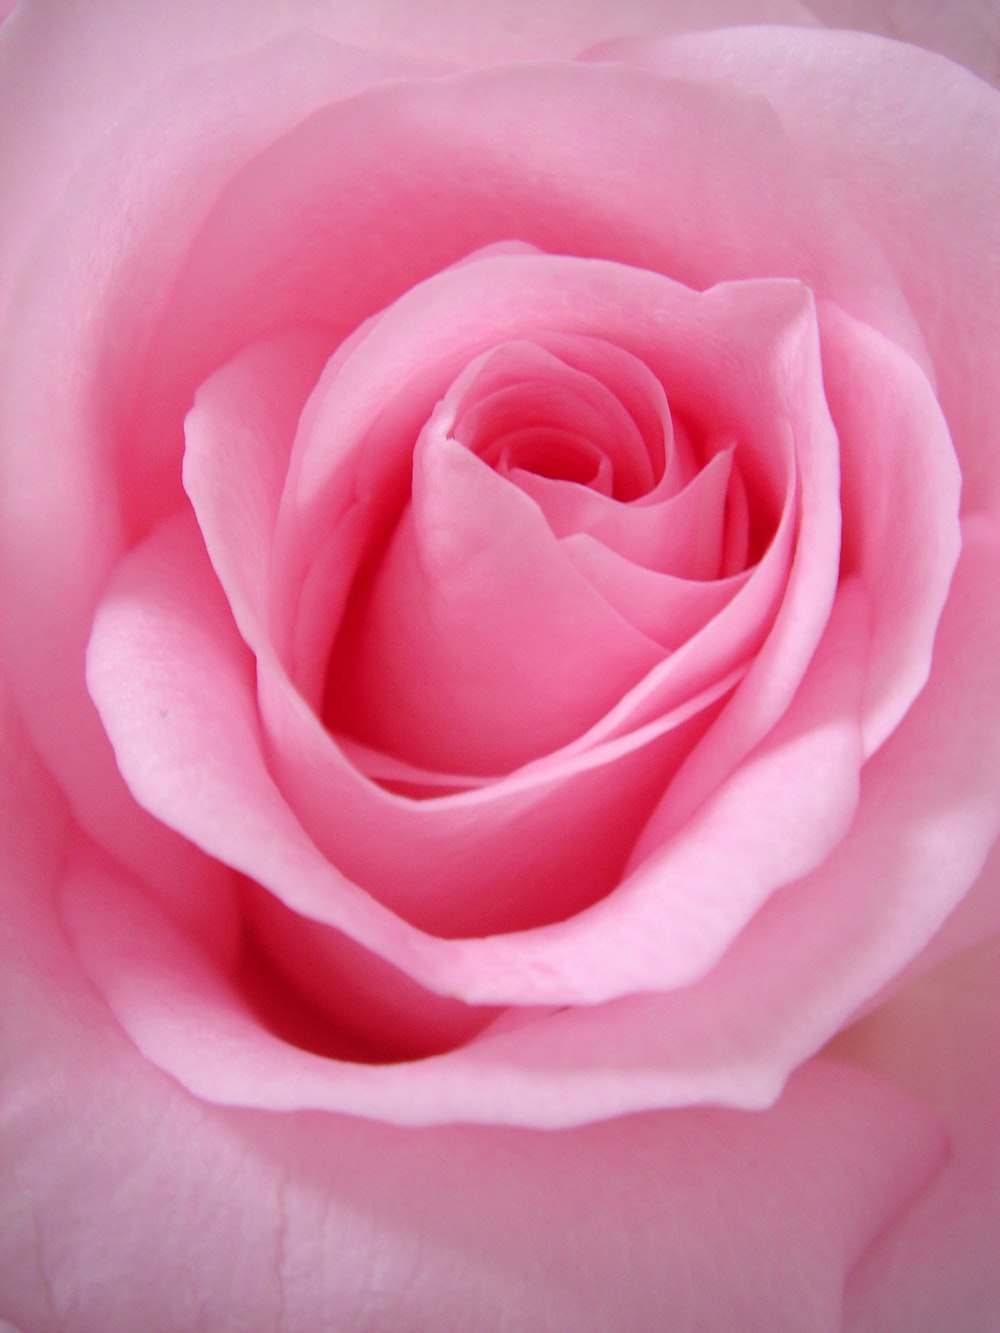 close up photo of pink rose